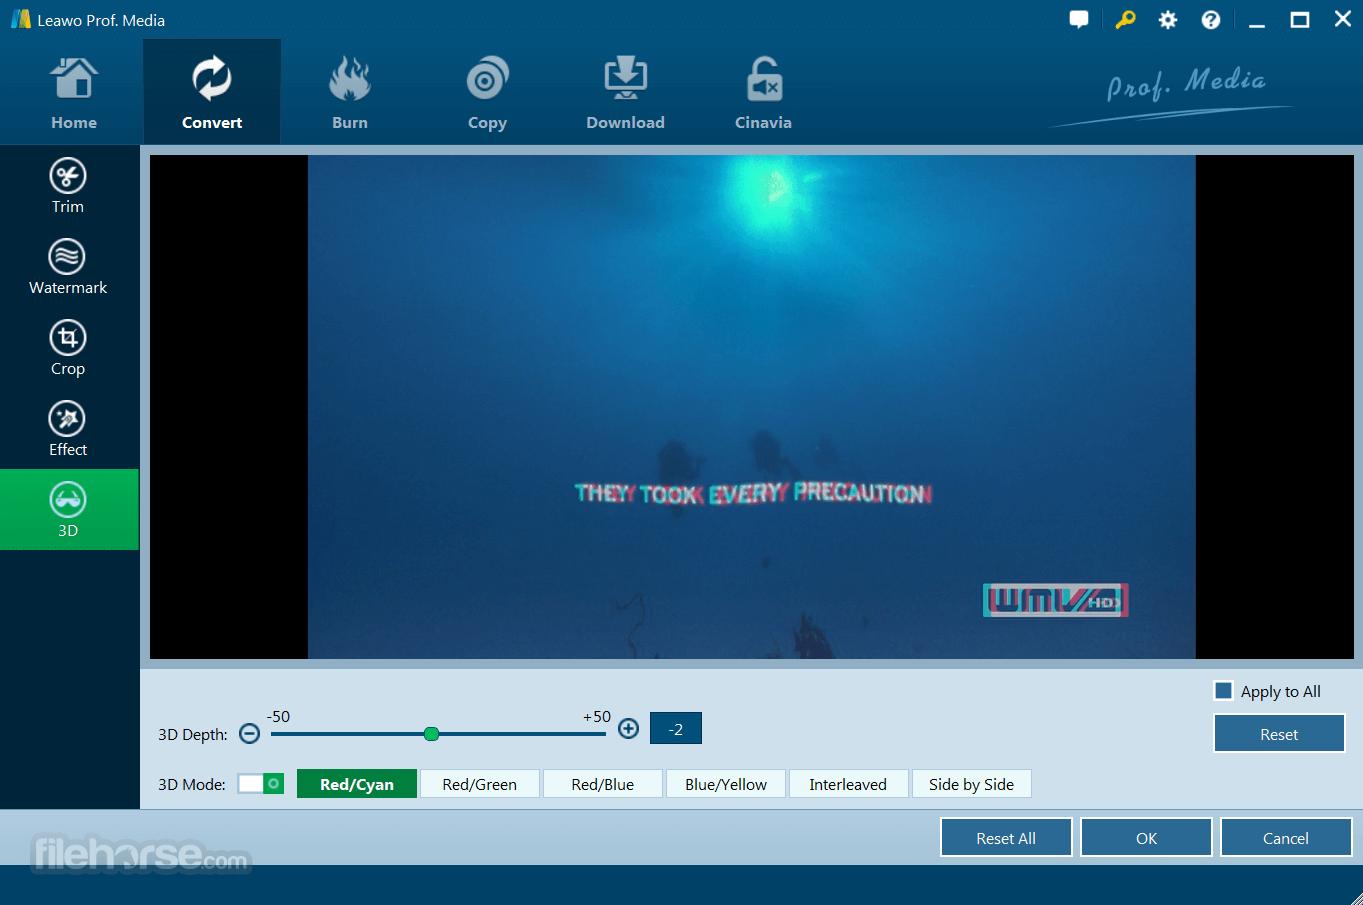 Leawo Blu-ray Ripper 8.3.0.0 Screenshot 5